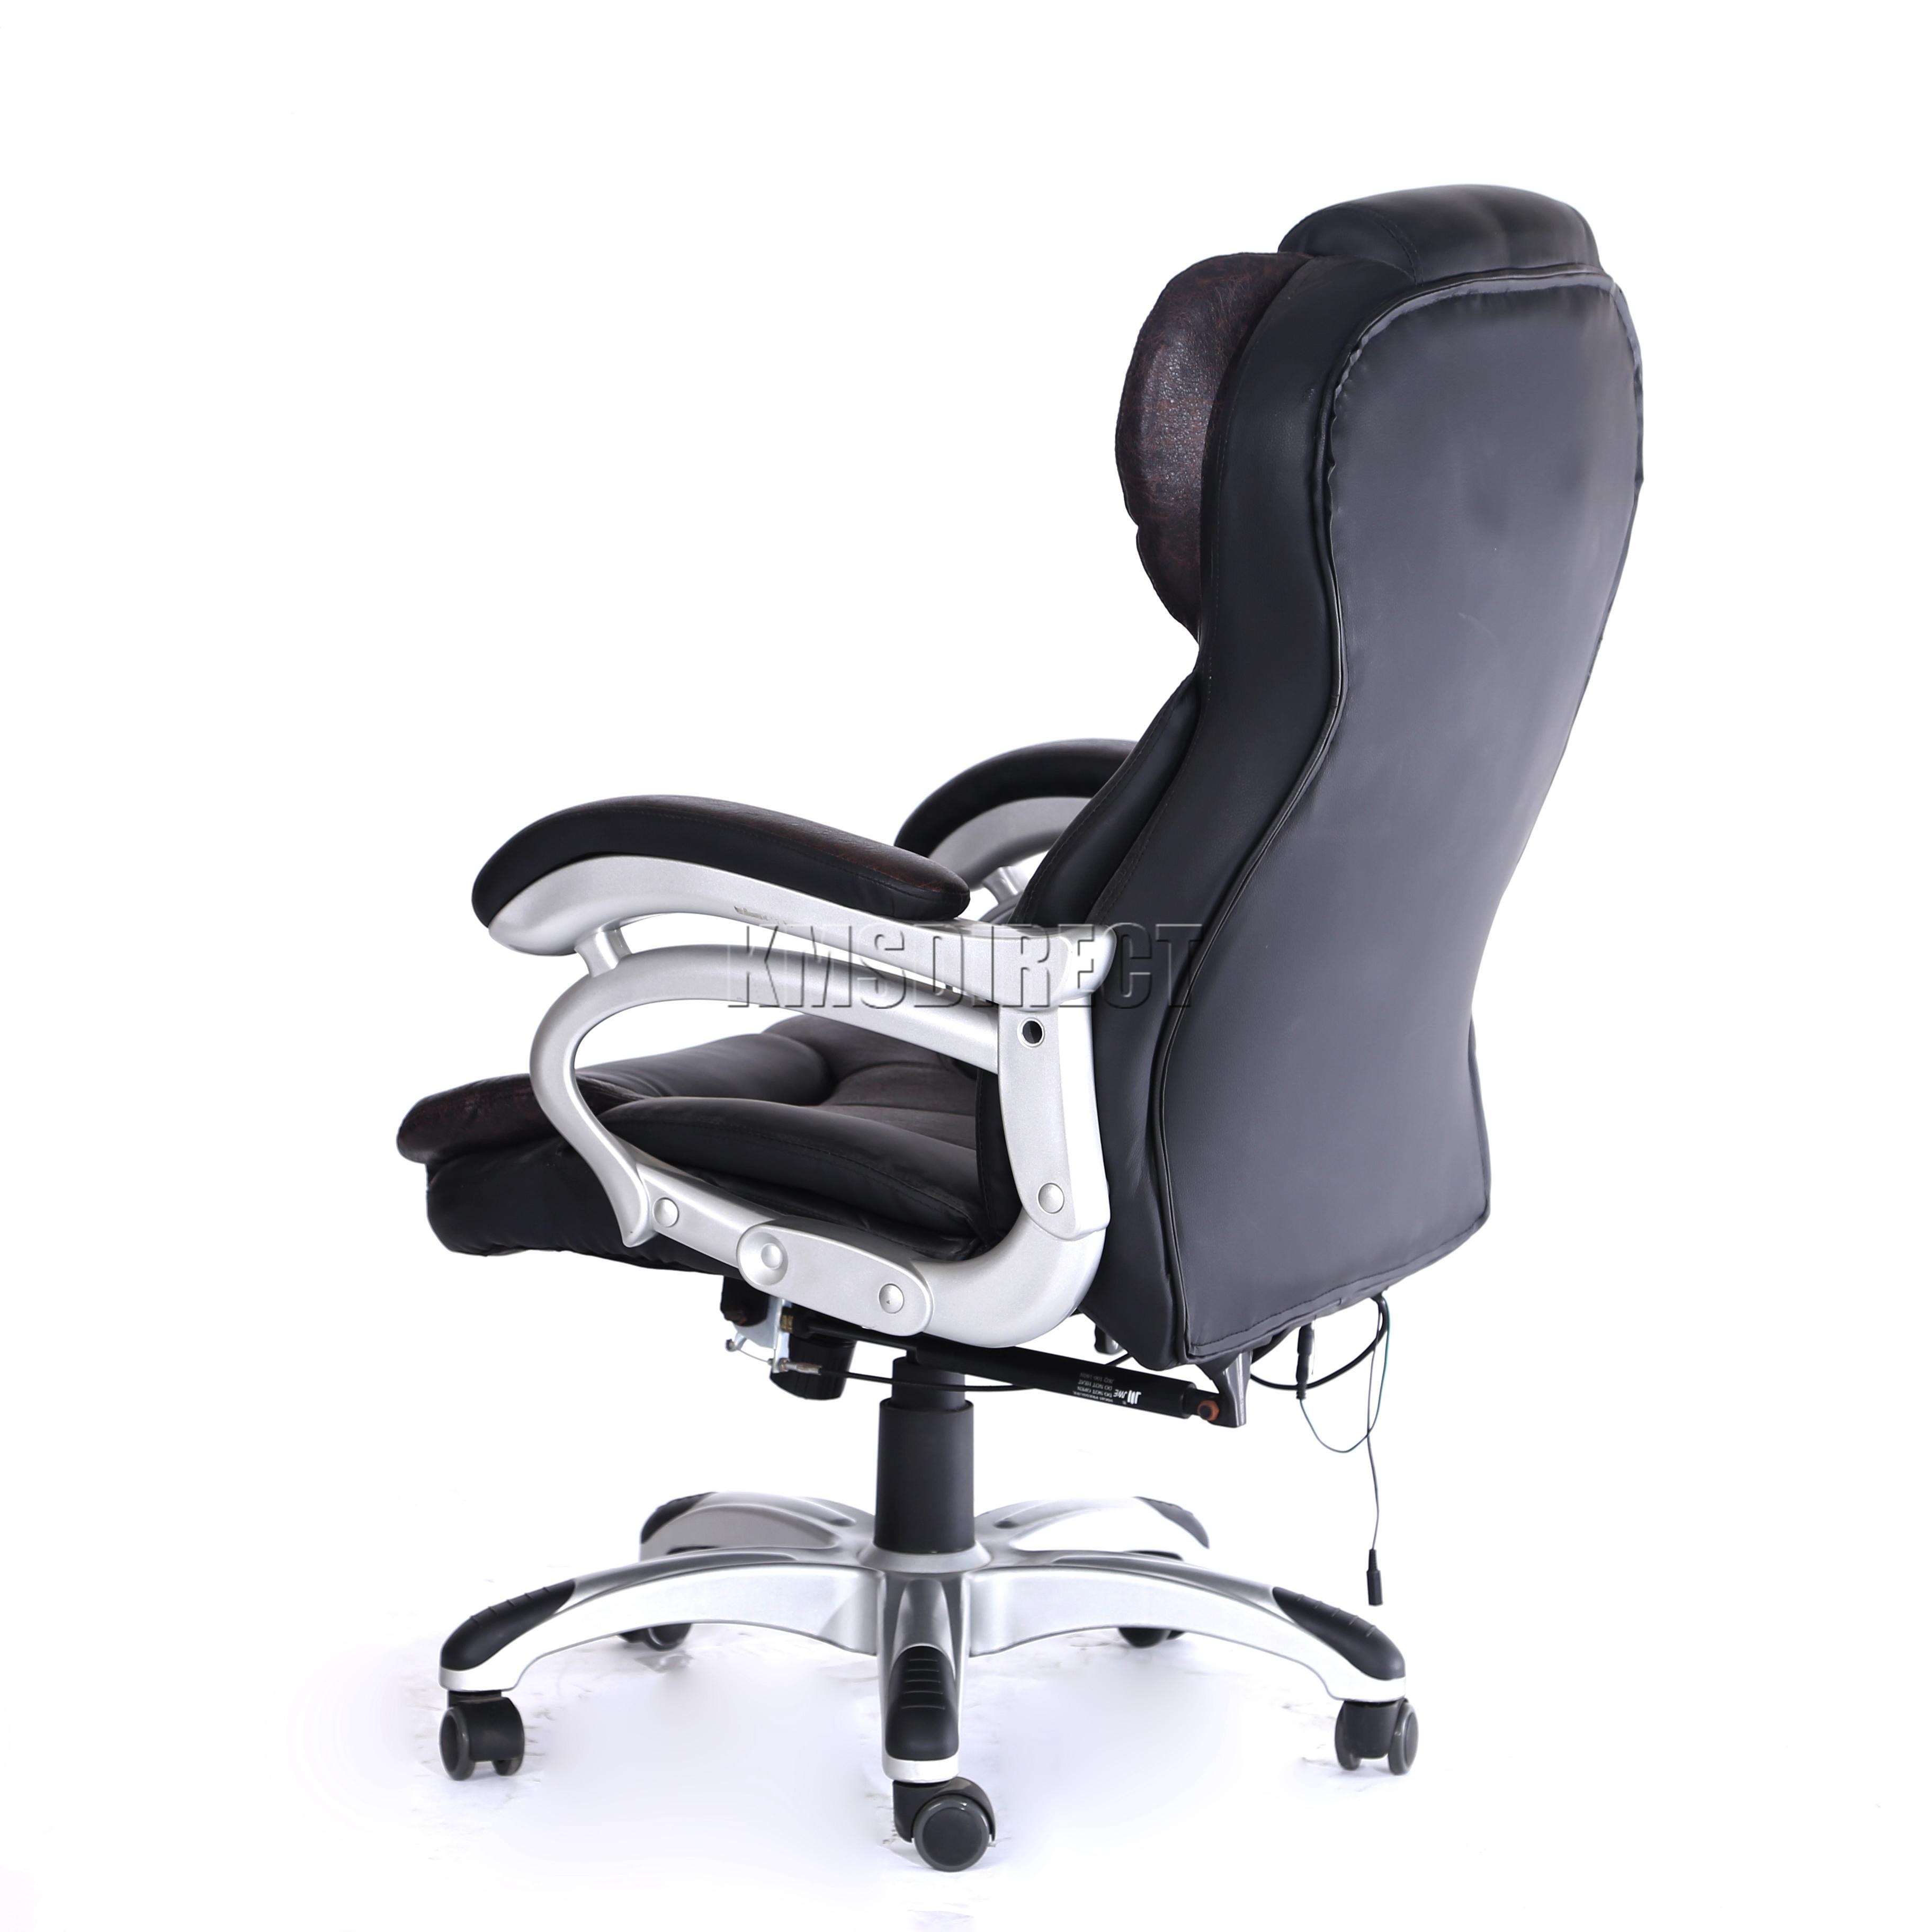 FoxHunter Luxury 6 Point Massage Office Computer Chair Reclining MC8074 Brown